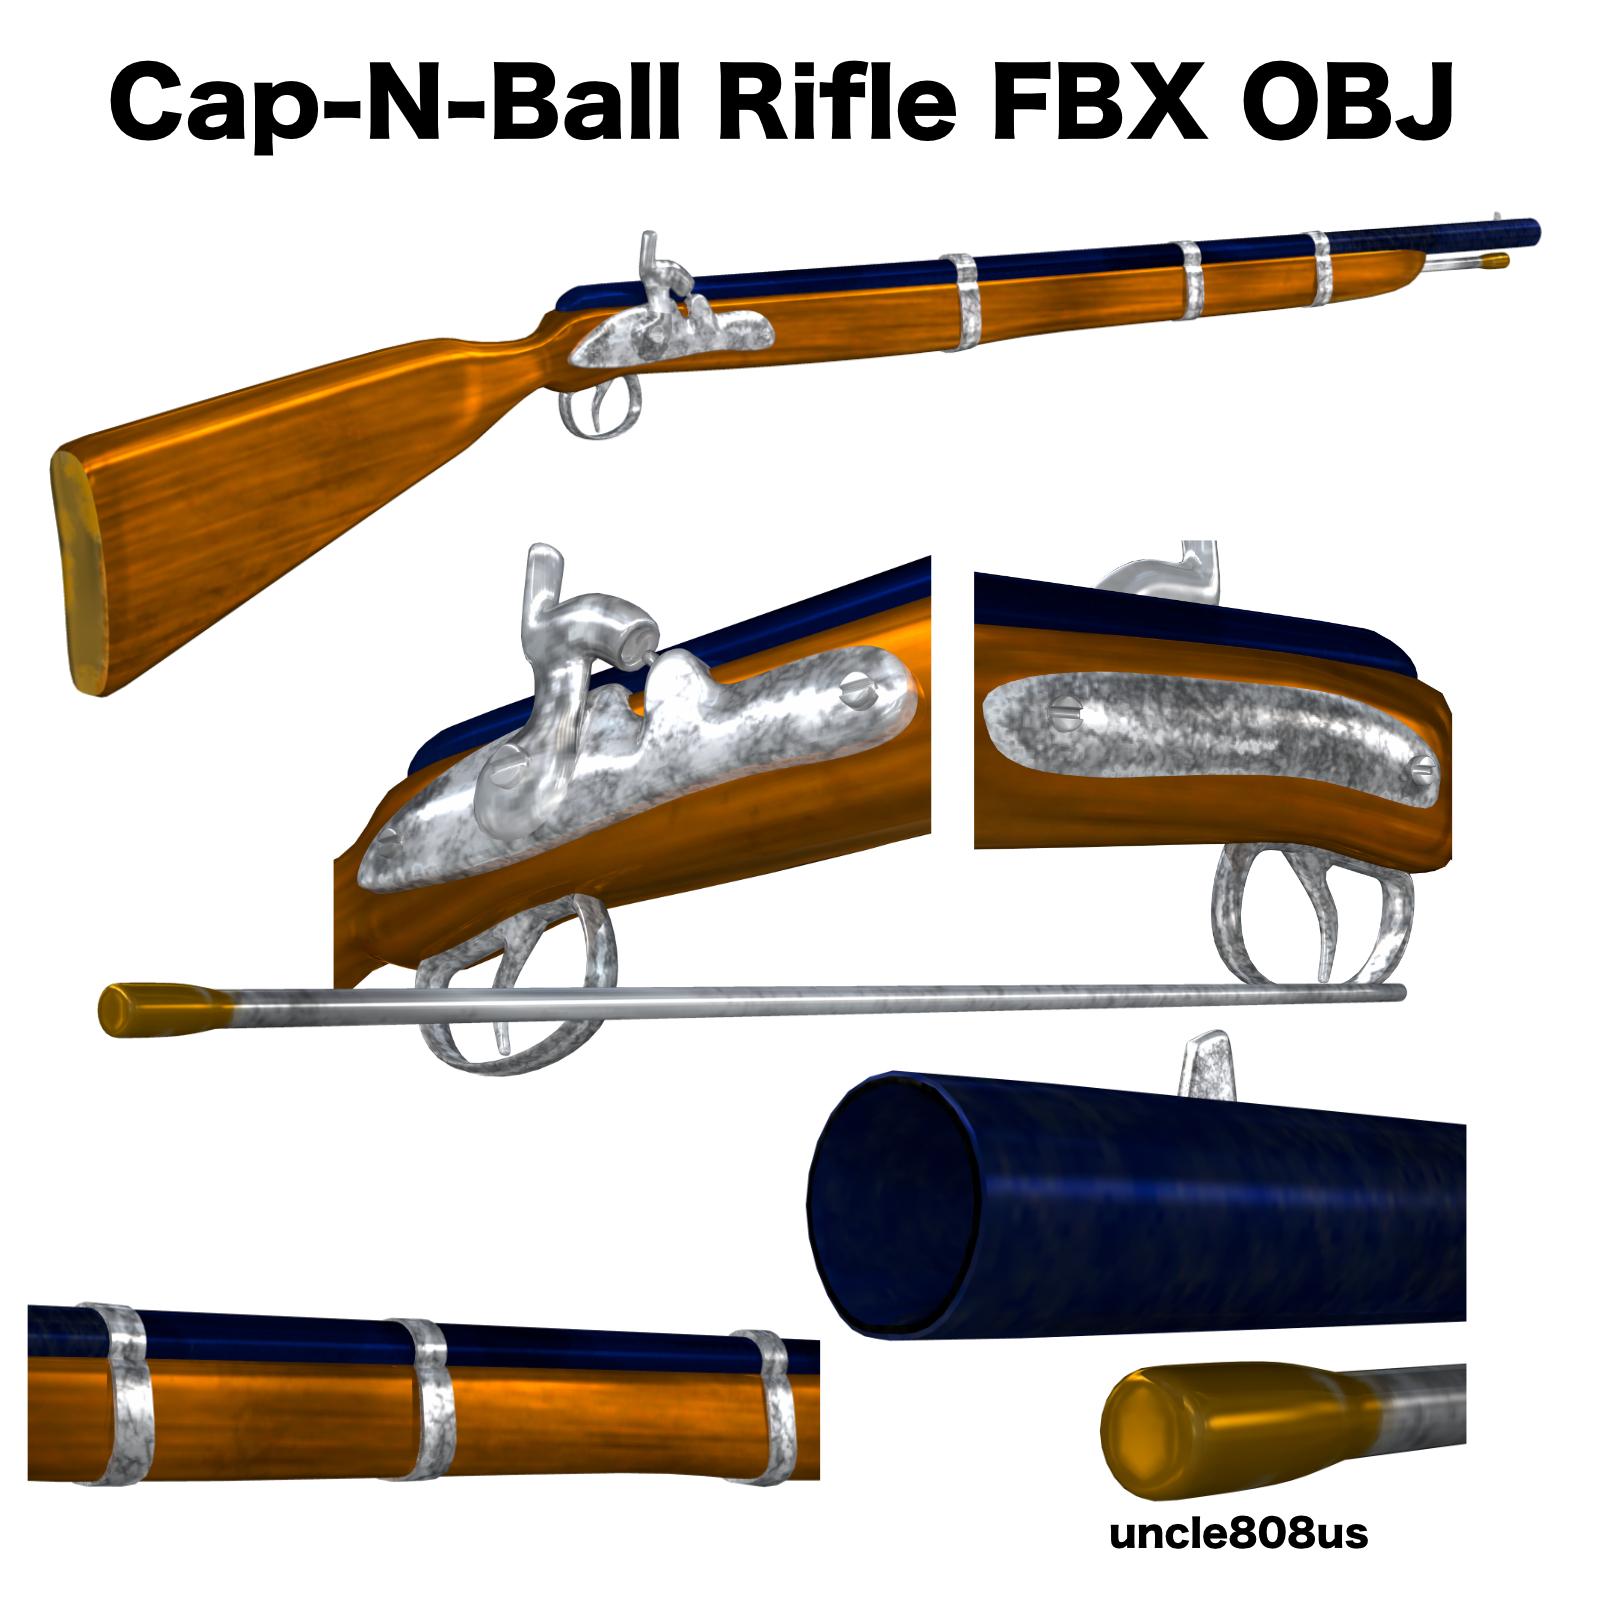 Cap-N-Ball Rifle FBX OBJ 3d model fbx 220981